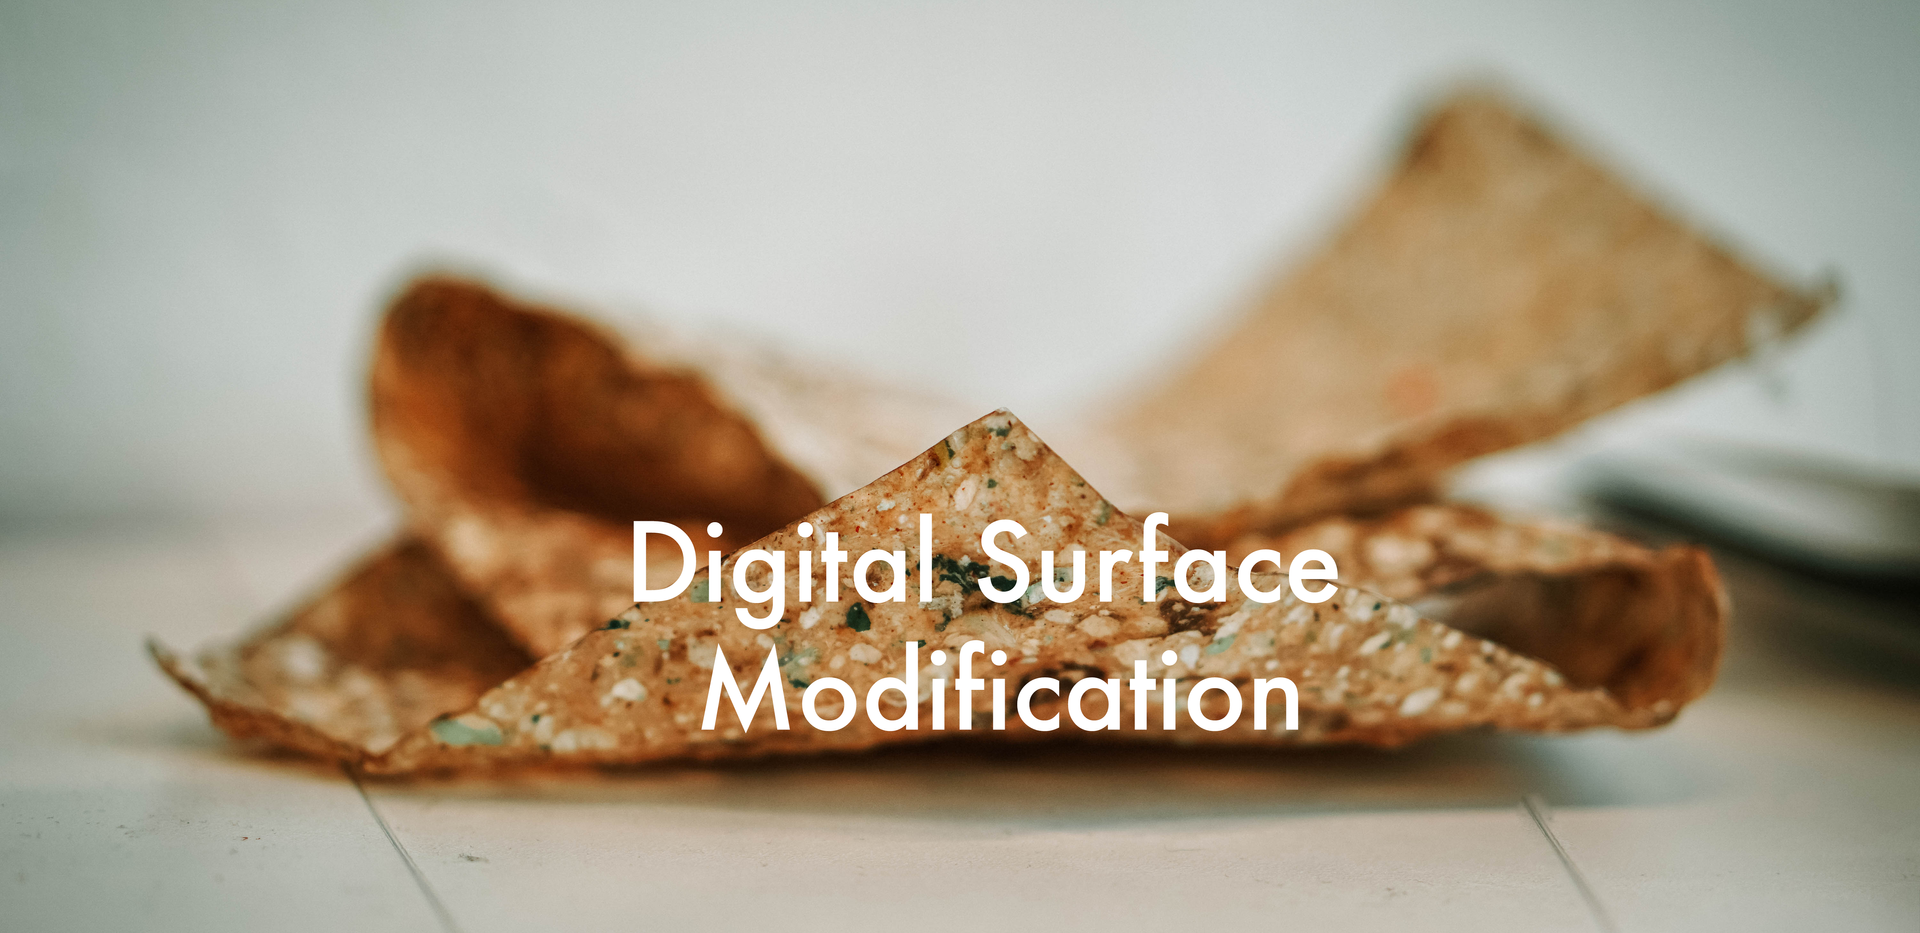 Digital Surface Modification